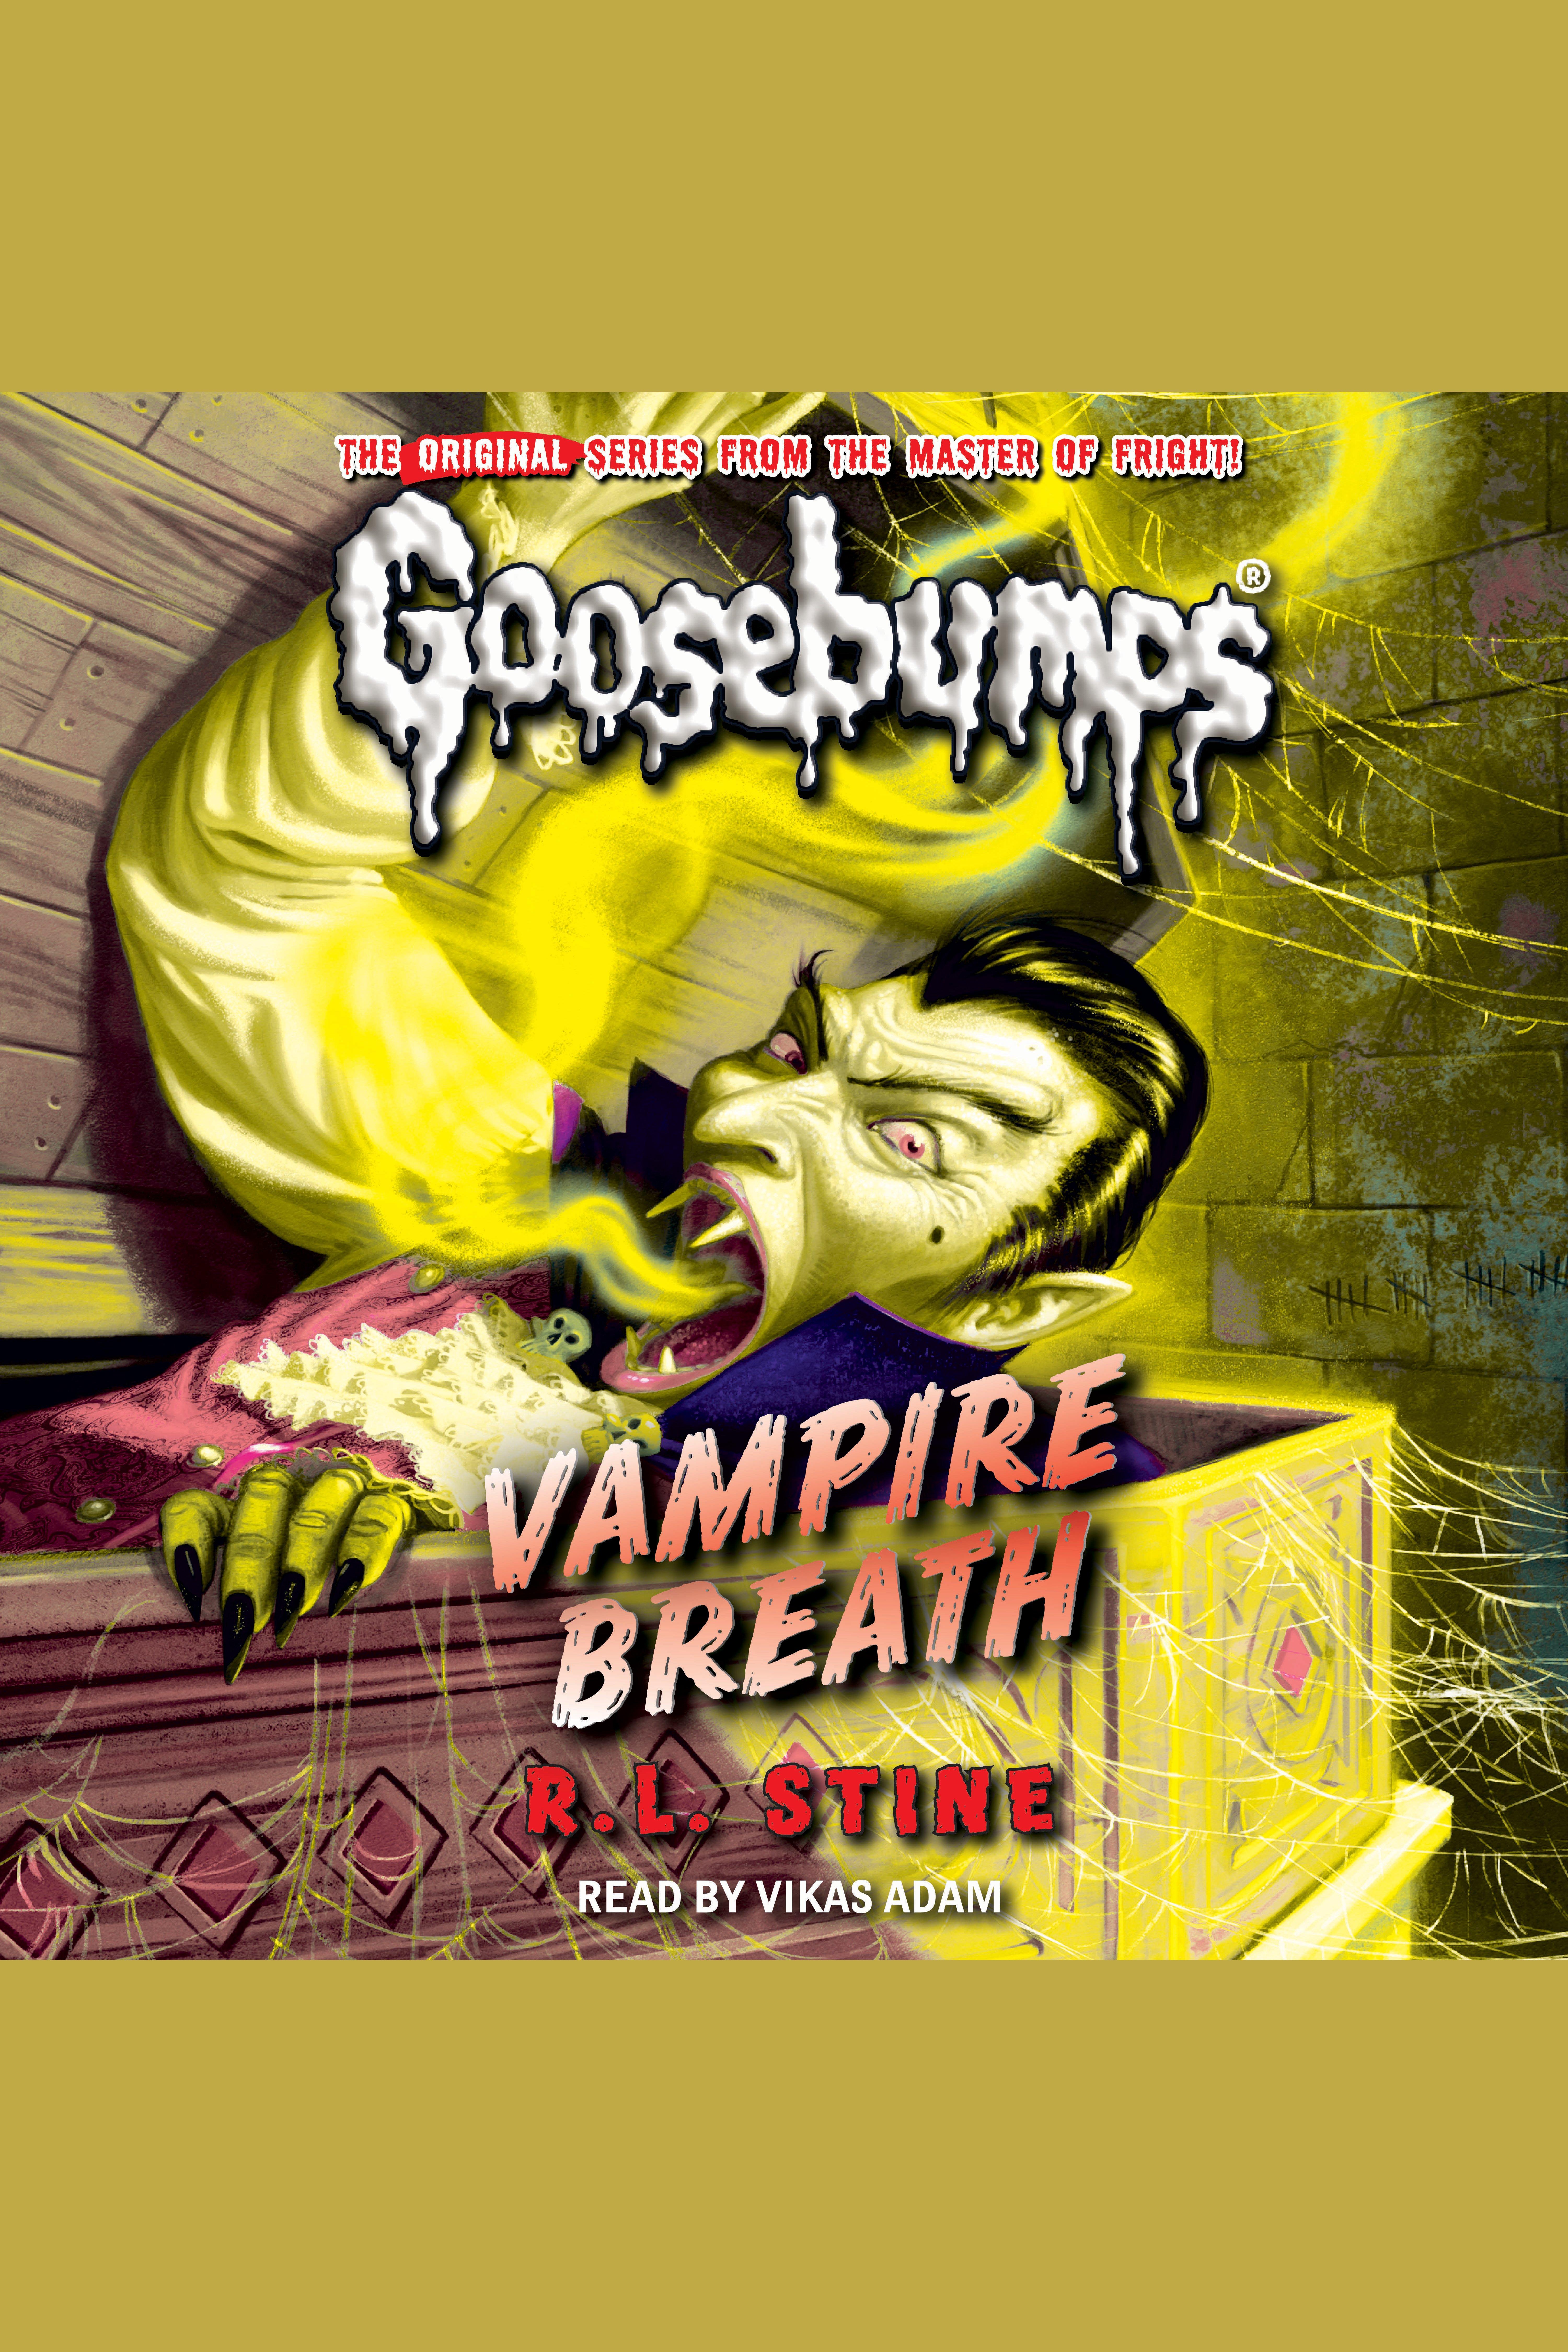 Classic Goosebumps - Vampire Breath Vampire Breath